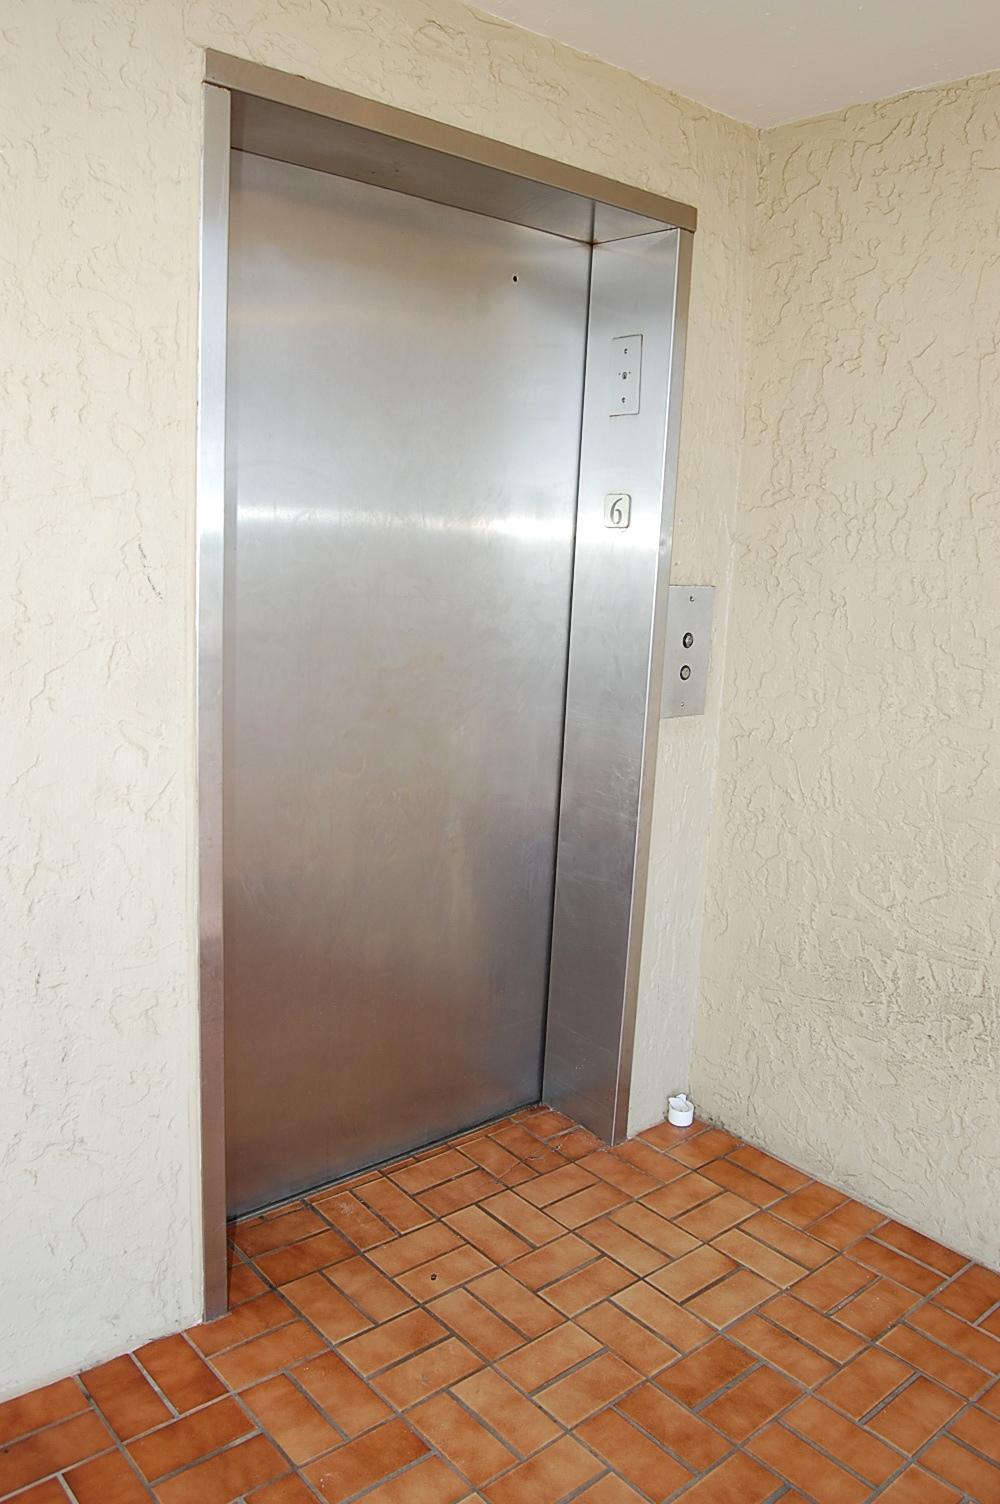 Gulf House 606 Condo rental in Gulf House Condominiums in Gulf Shores Alabama - #31